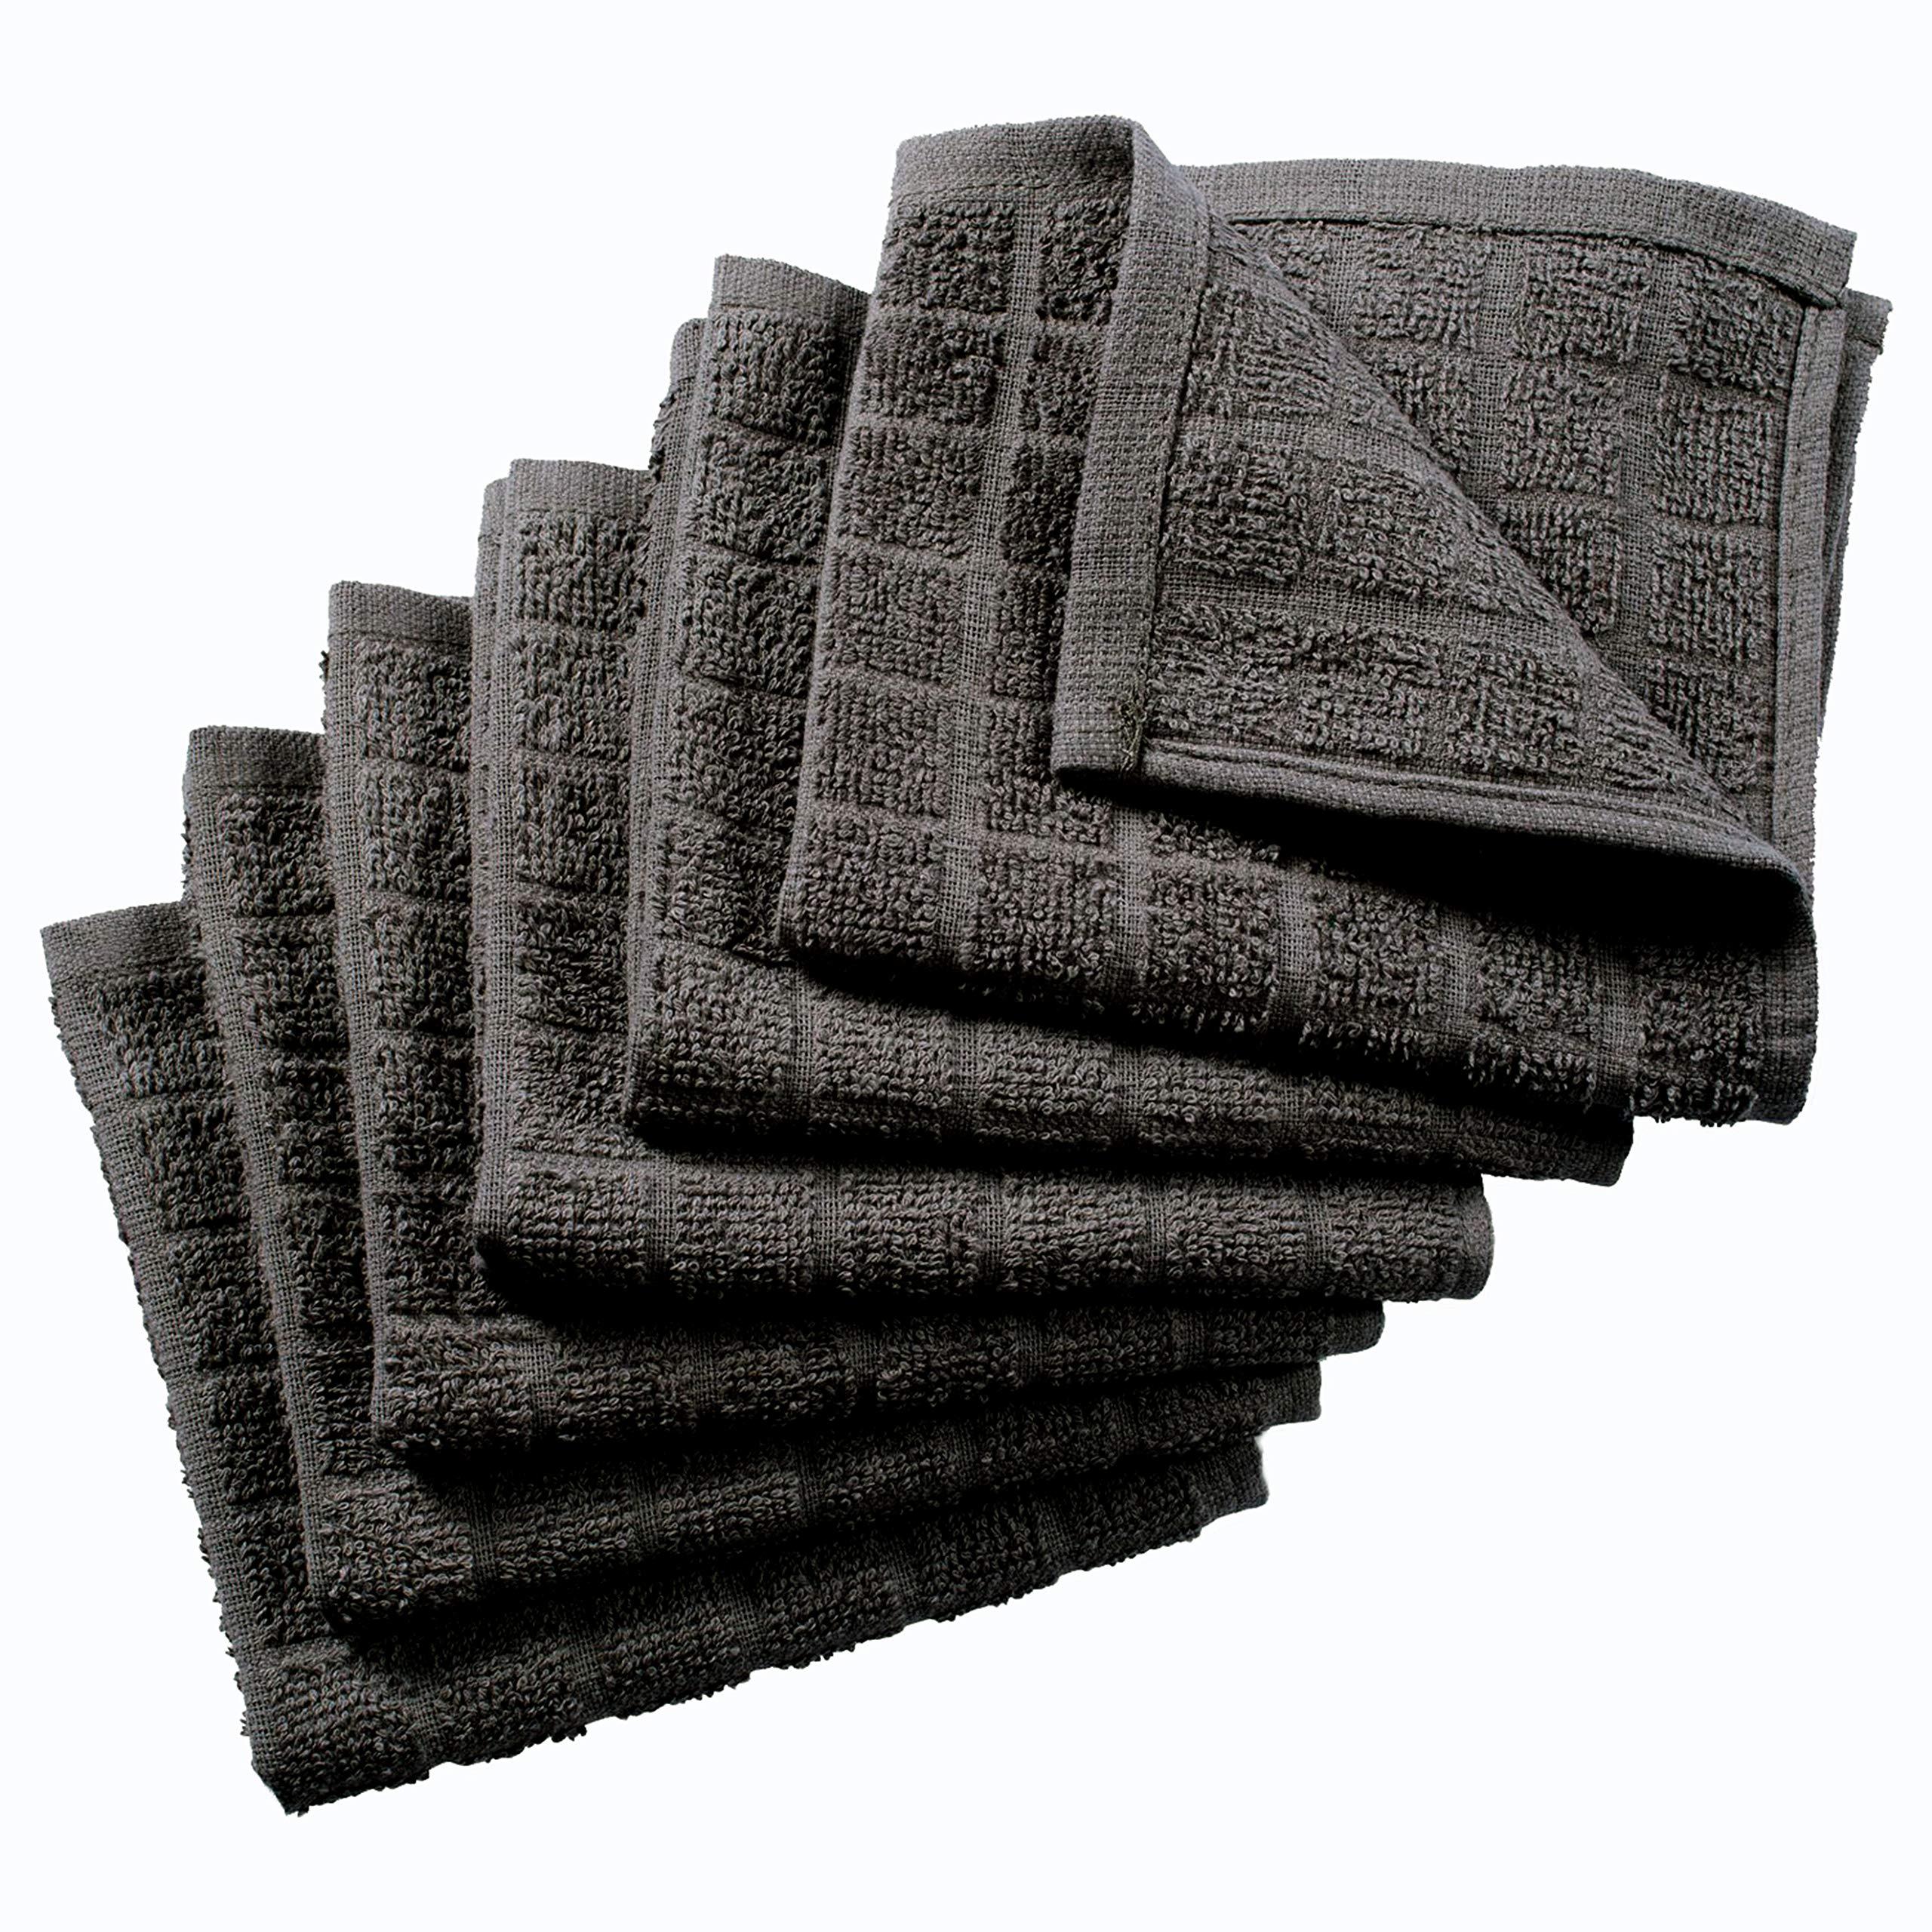 Nirisha Cotton Terry Dish Cloth - 6 Pack - Grey - 12 x 12 Inches - 400 GSM - 100% Ringspun 2 Ply Cotton - Box Weave - Soft & High Absorbent